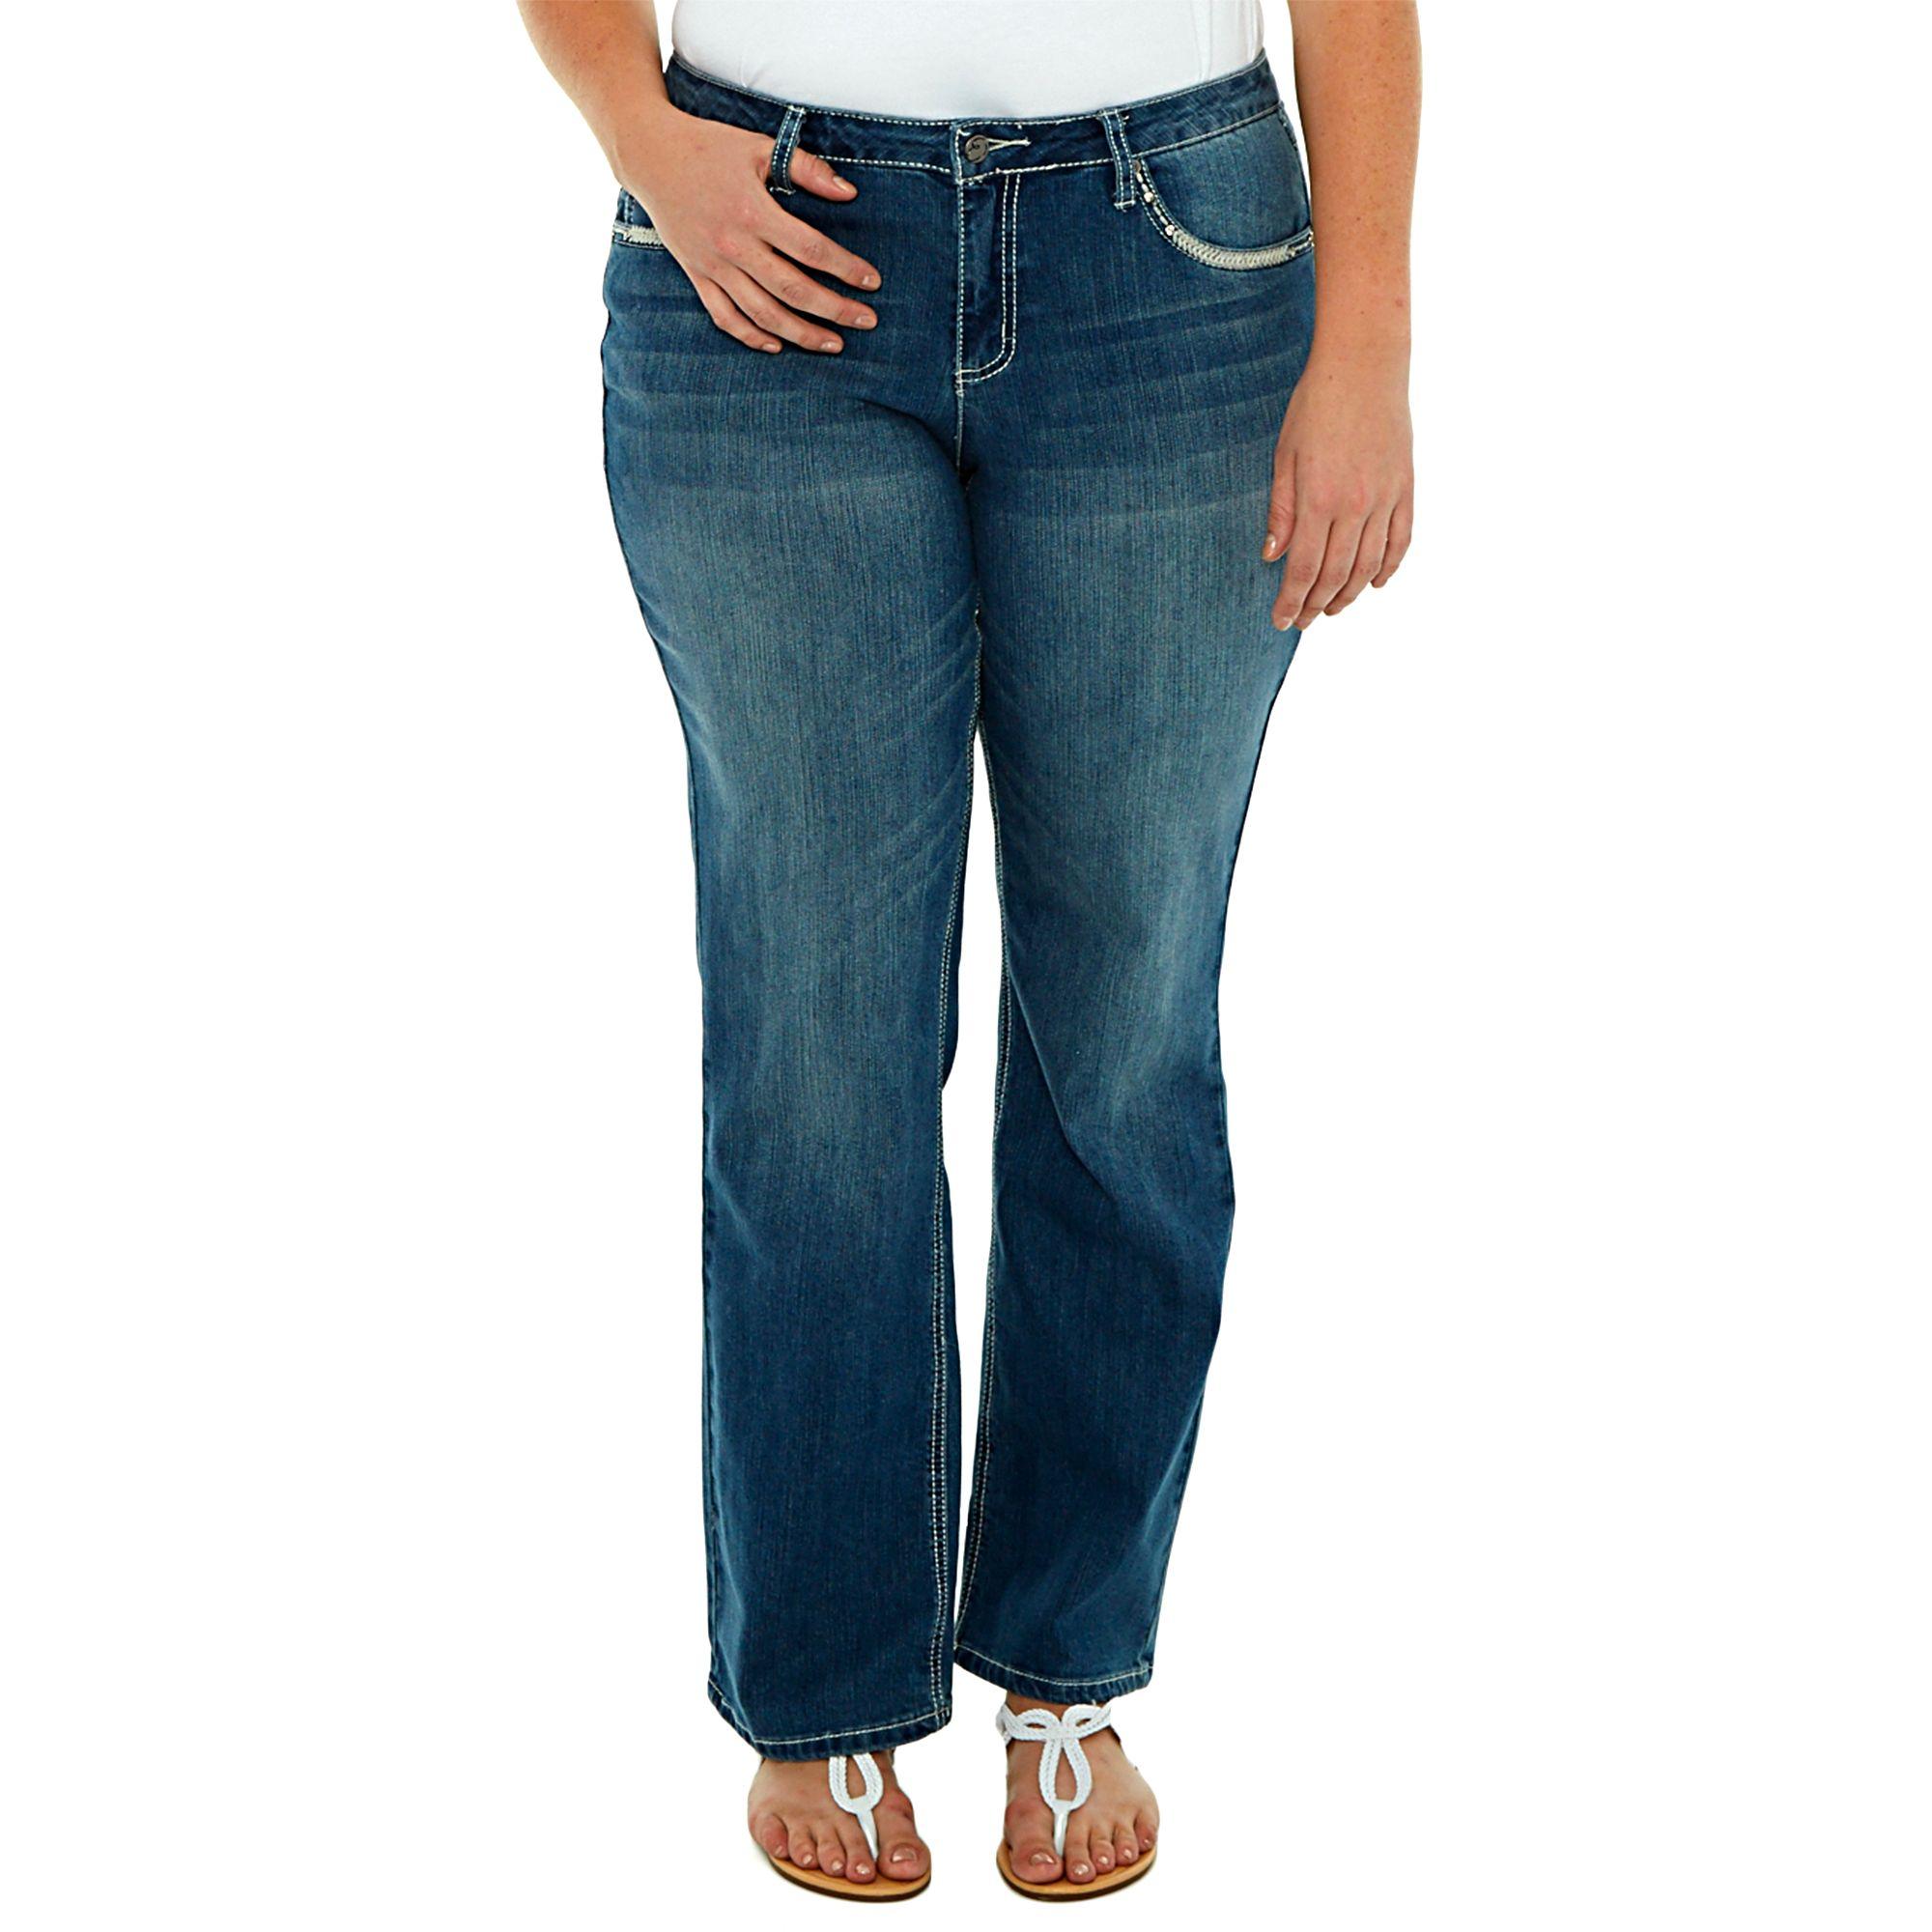 f15dbda3f08a26 Women s Plus Size Clothing